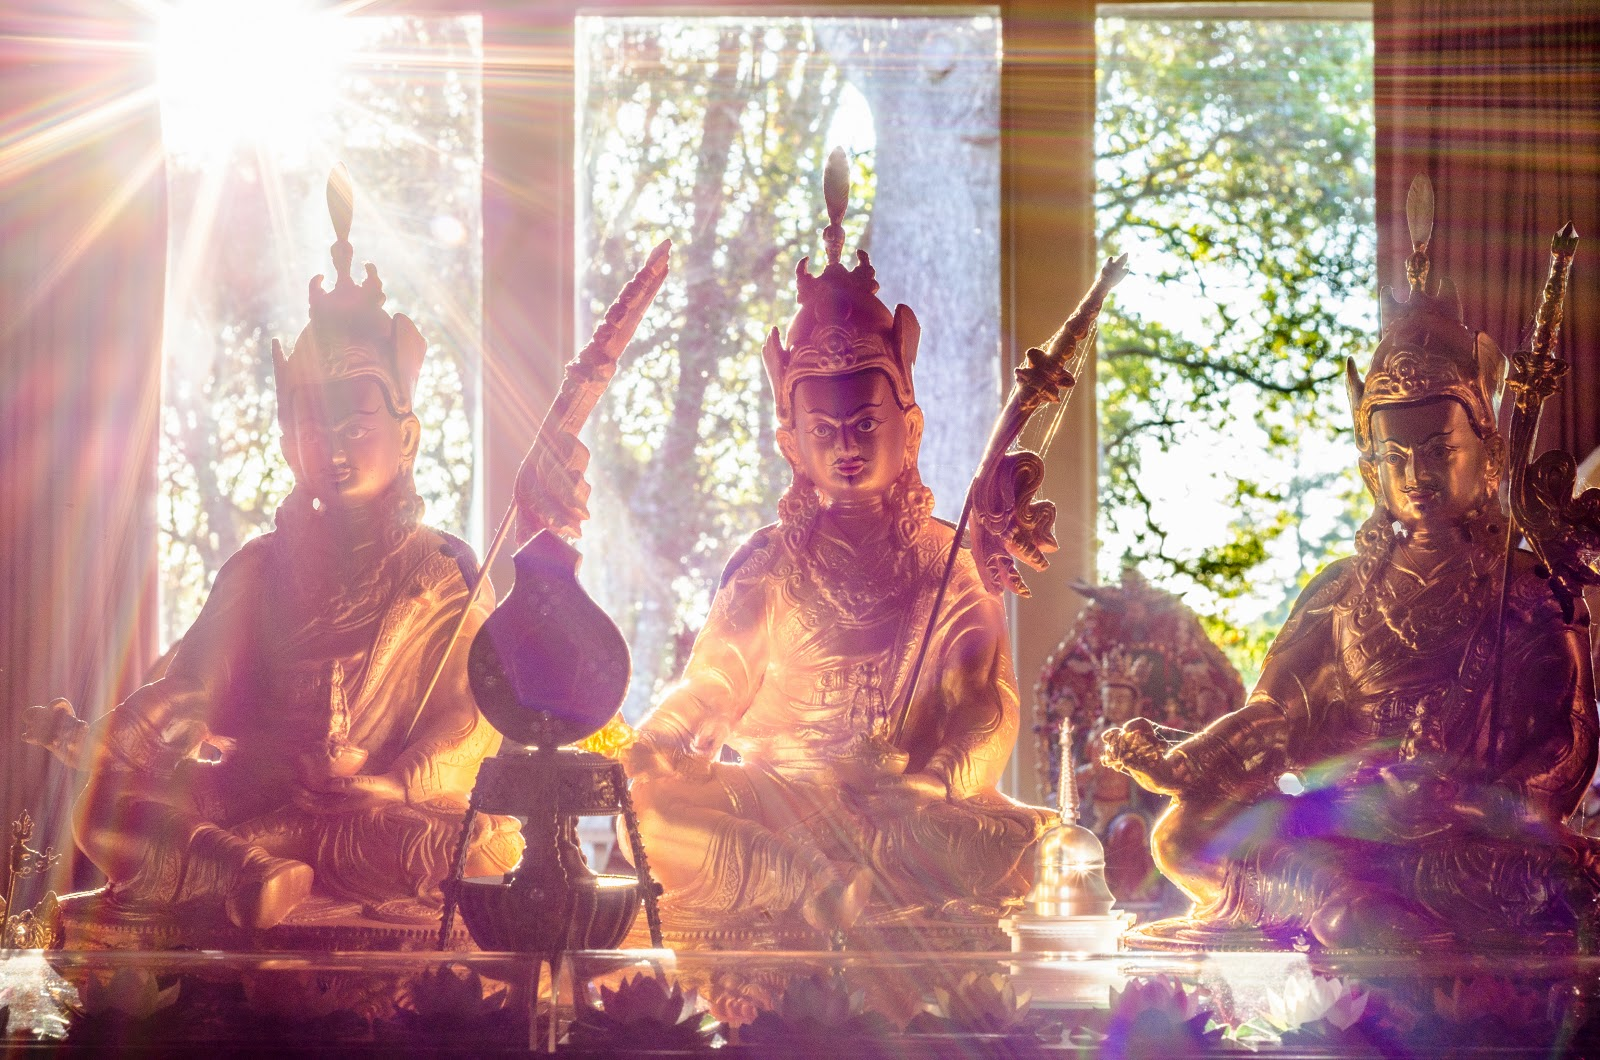 Padmasambhava statues at Kachoe Dechen Ling. Photo by Chris Majors.